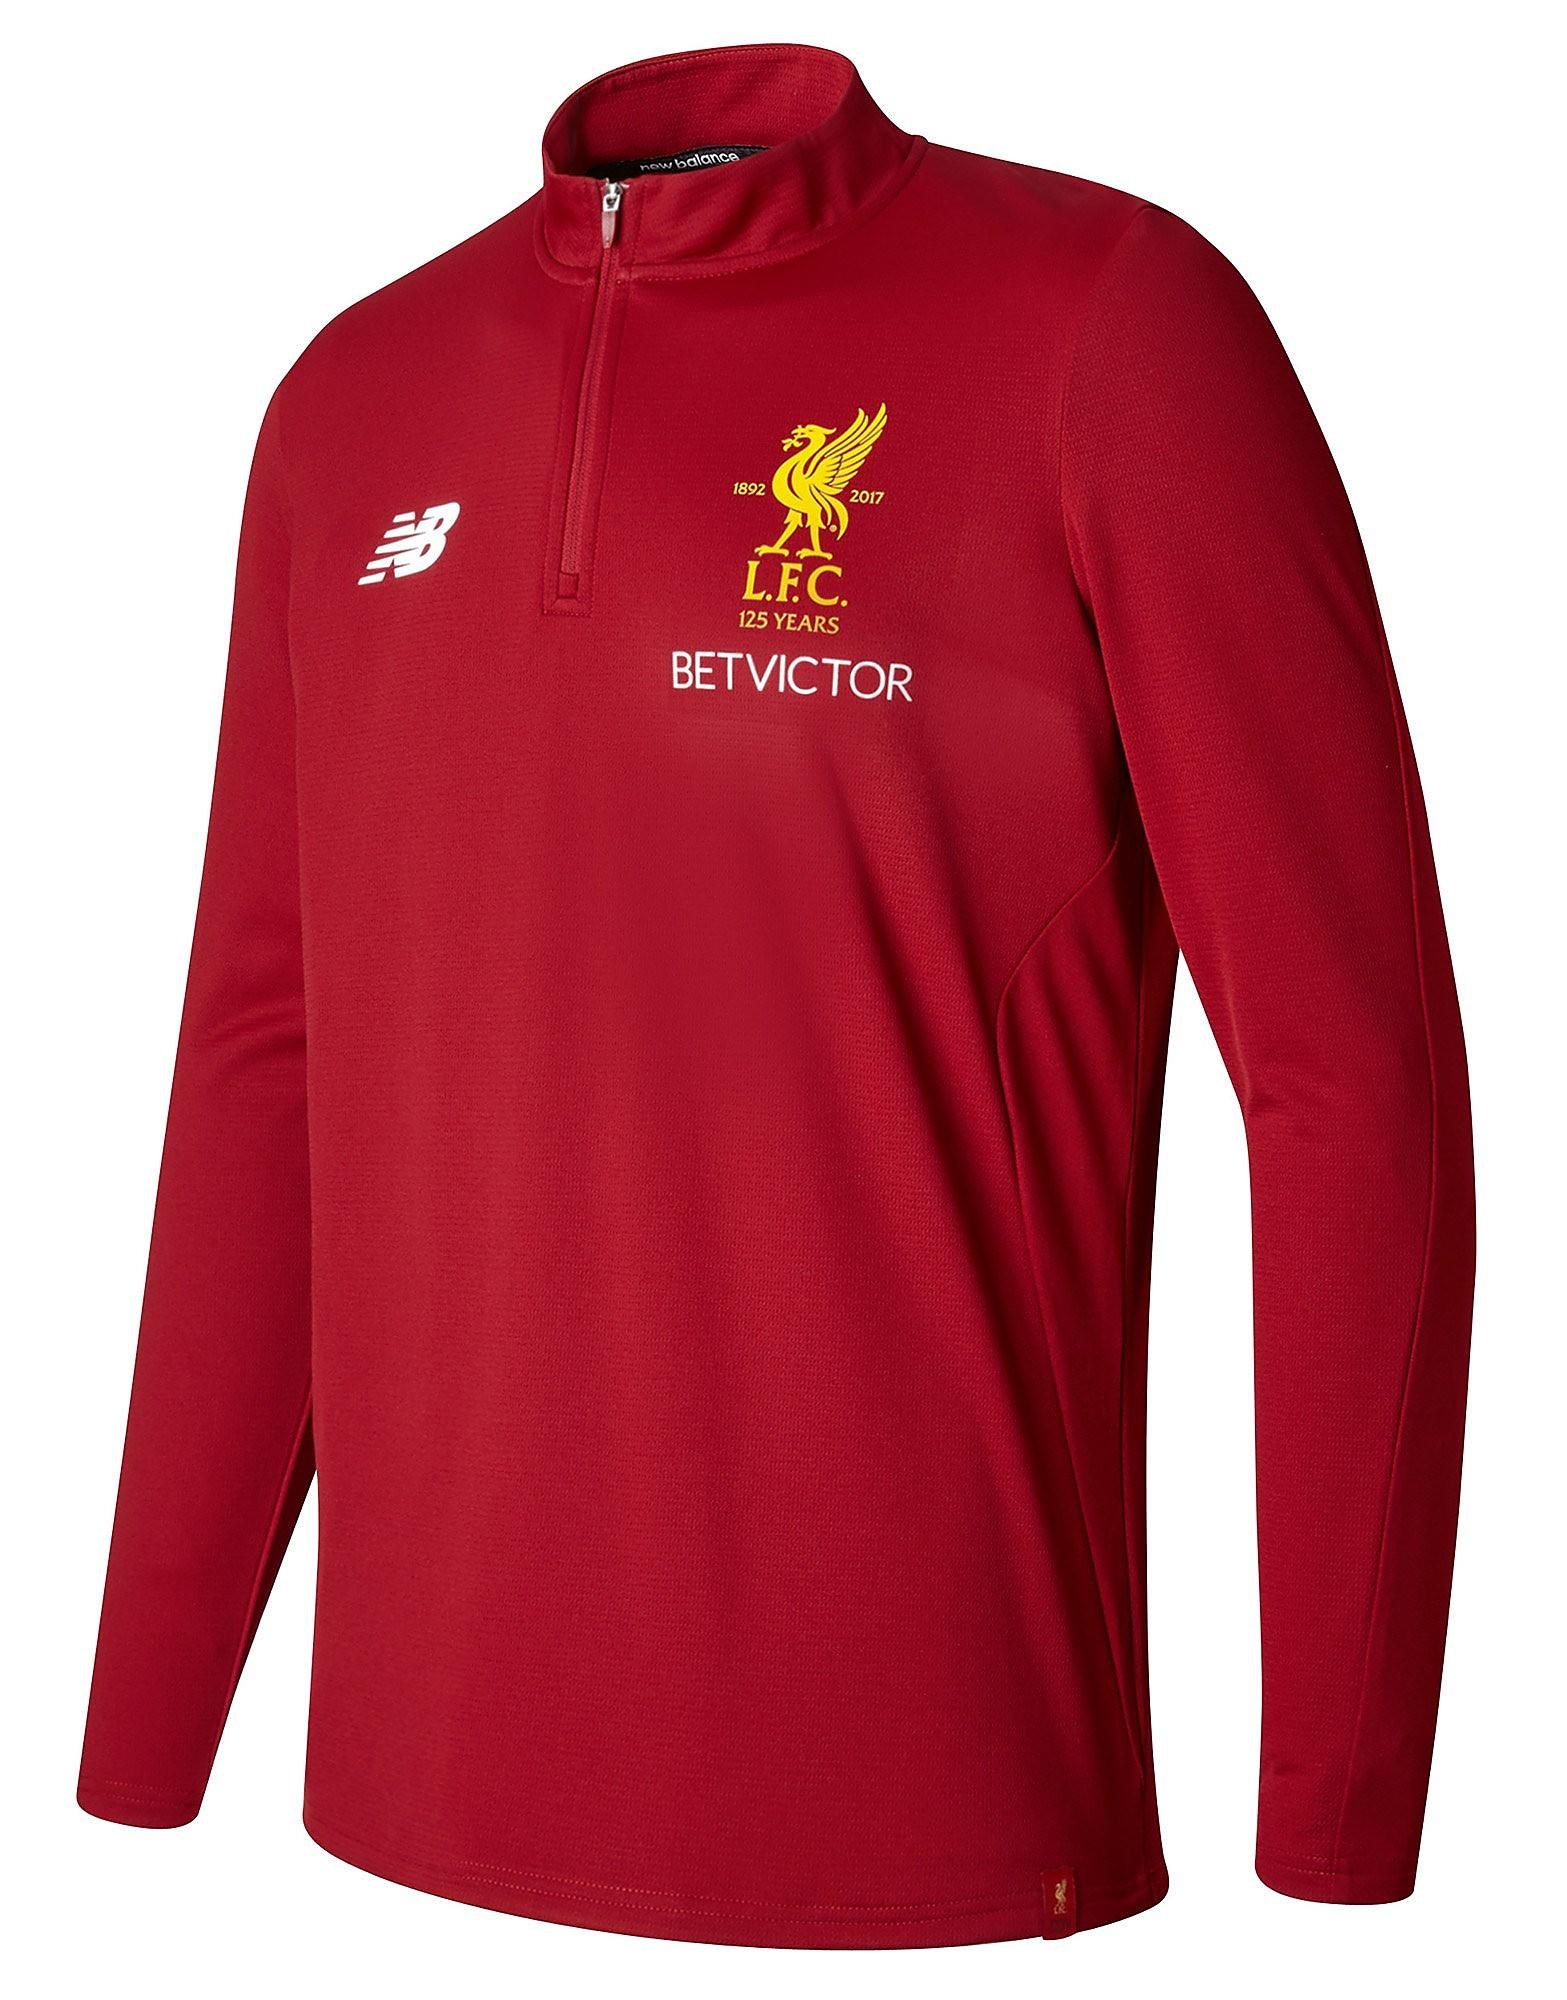 New Balance Top Liverpool FC 2017 1/2 Zip